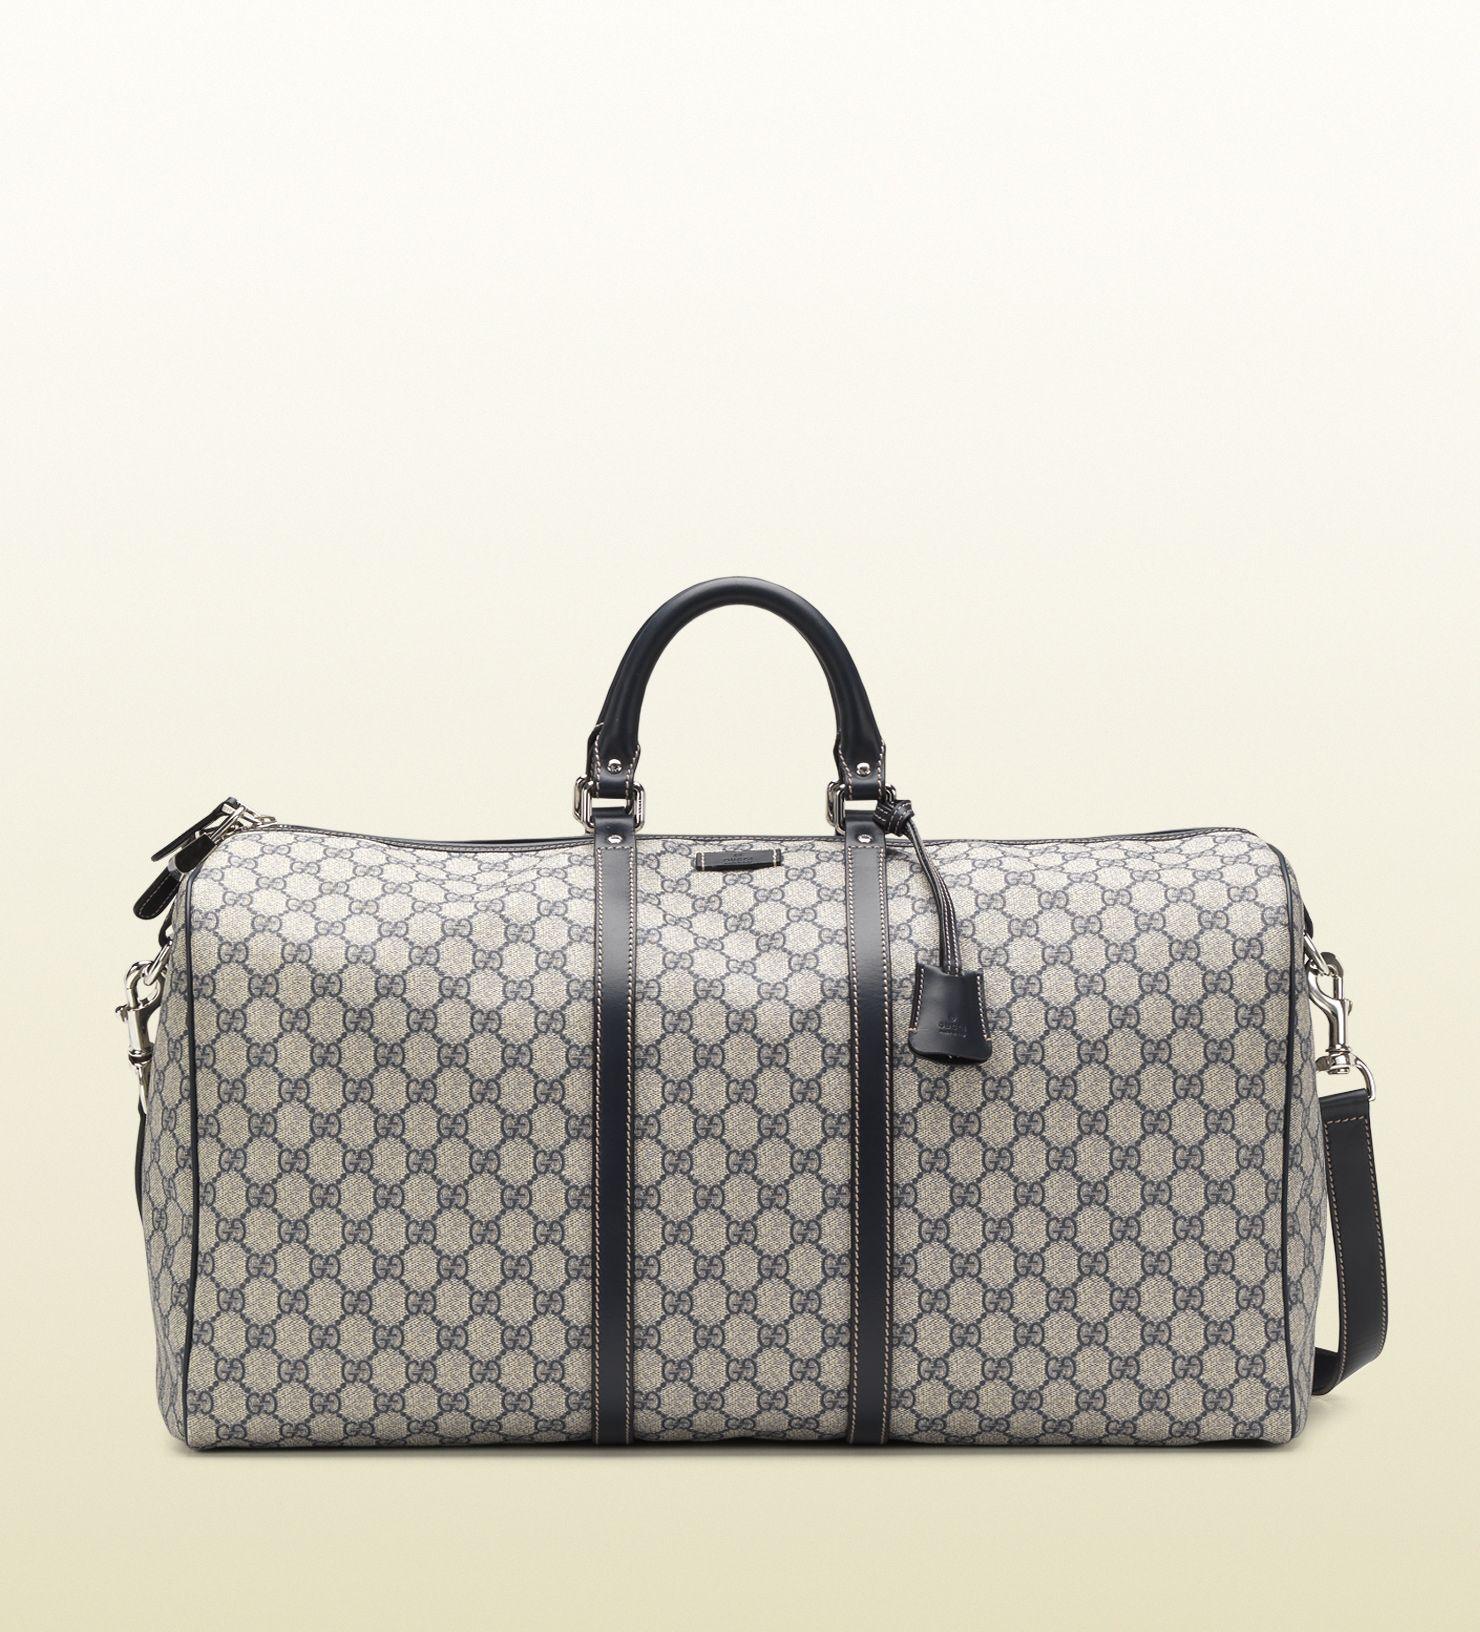 68661cea34acd4 large carry-on duffle bag | iwtbr | Borsoni da viaggio, Gucci, Borse